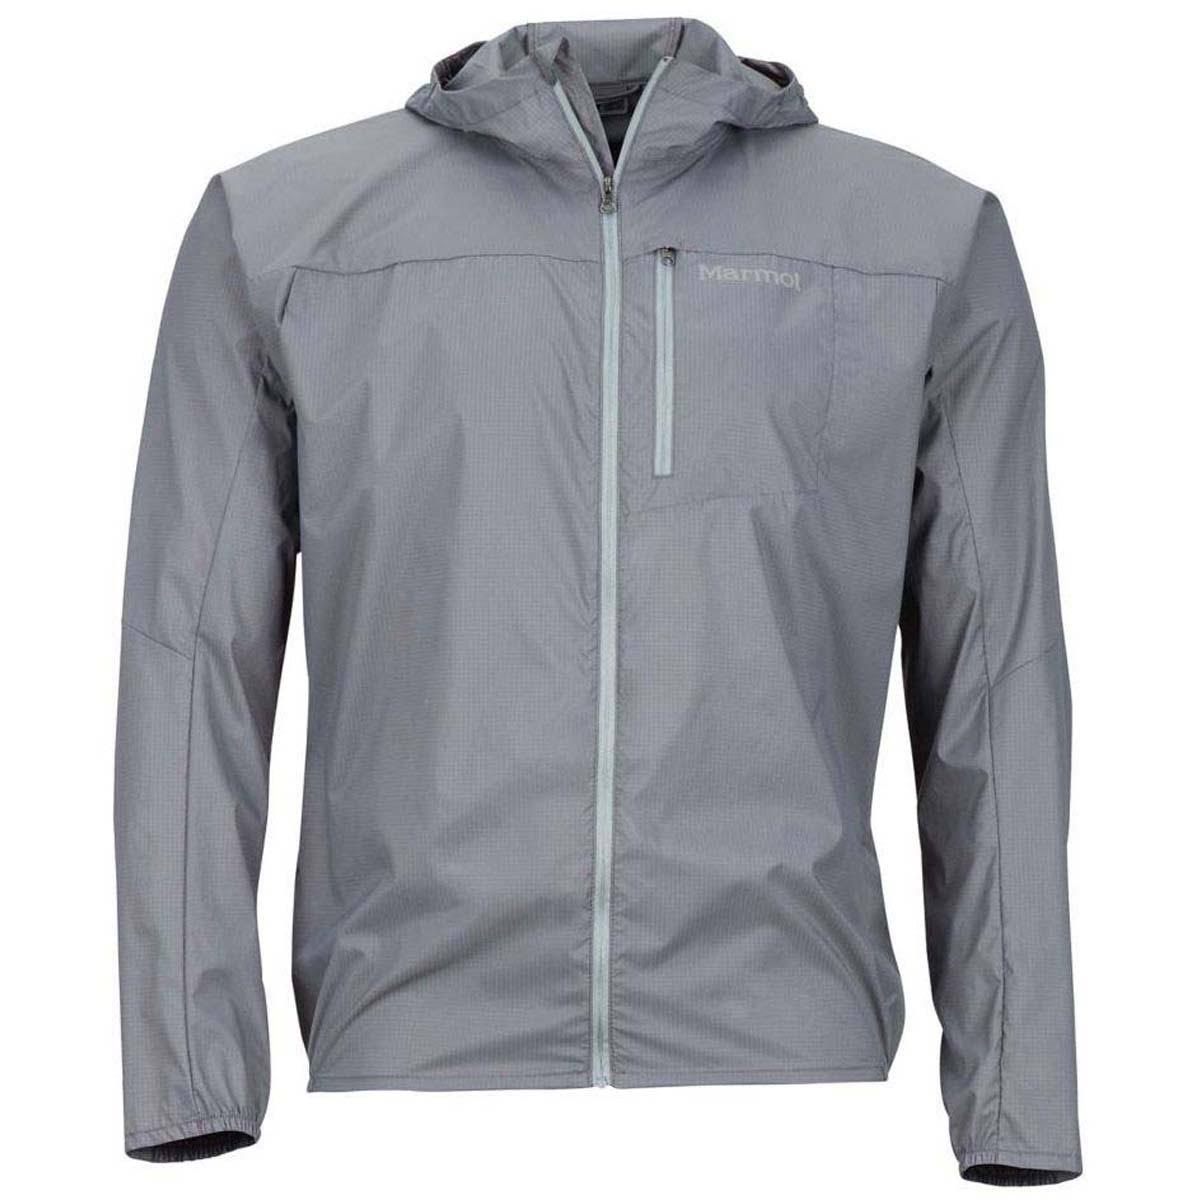 Lite Jacket Marmot Xl Herren Air Cinder 5qwBE1H